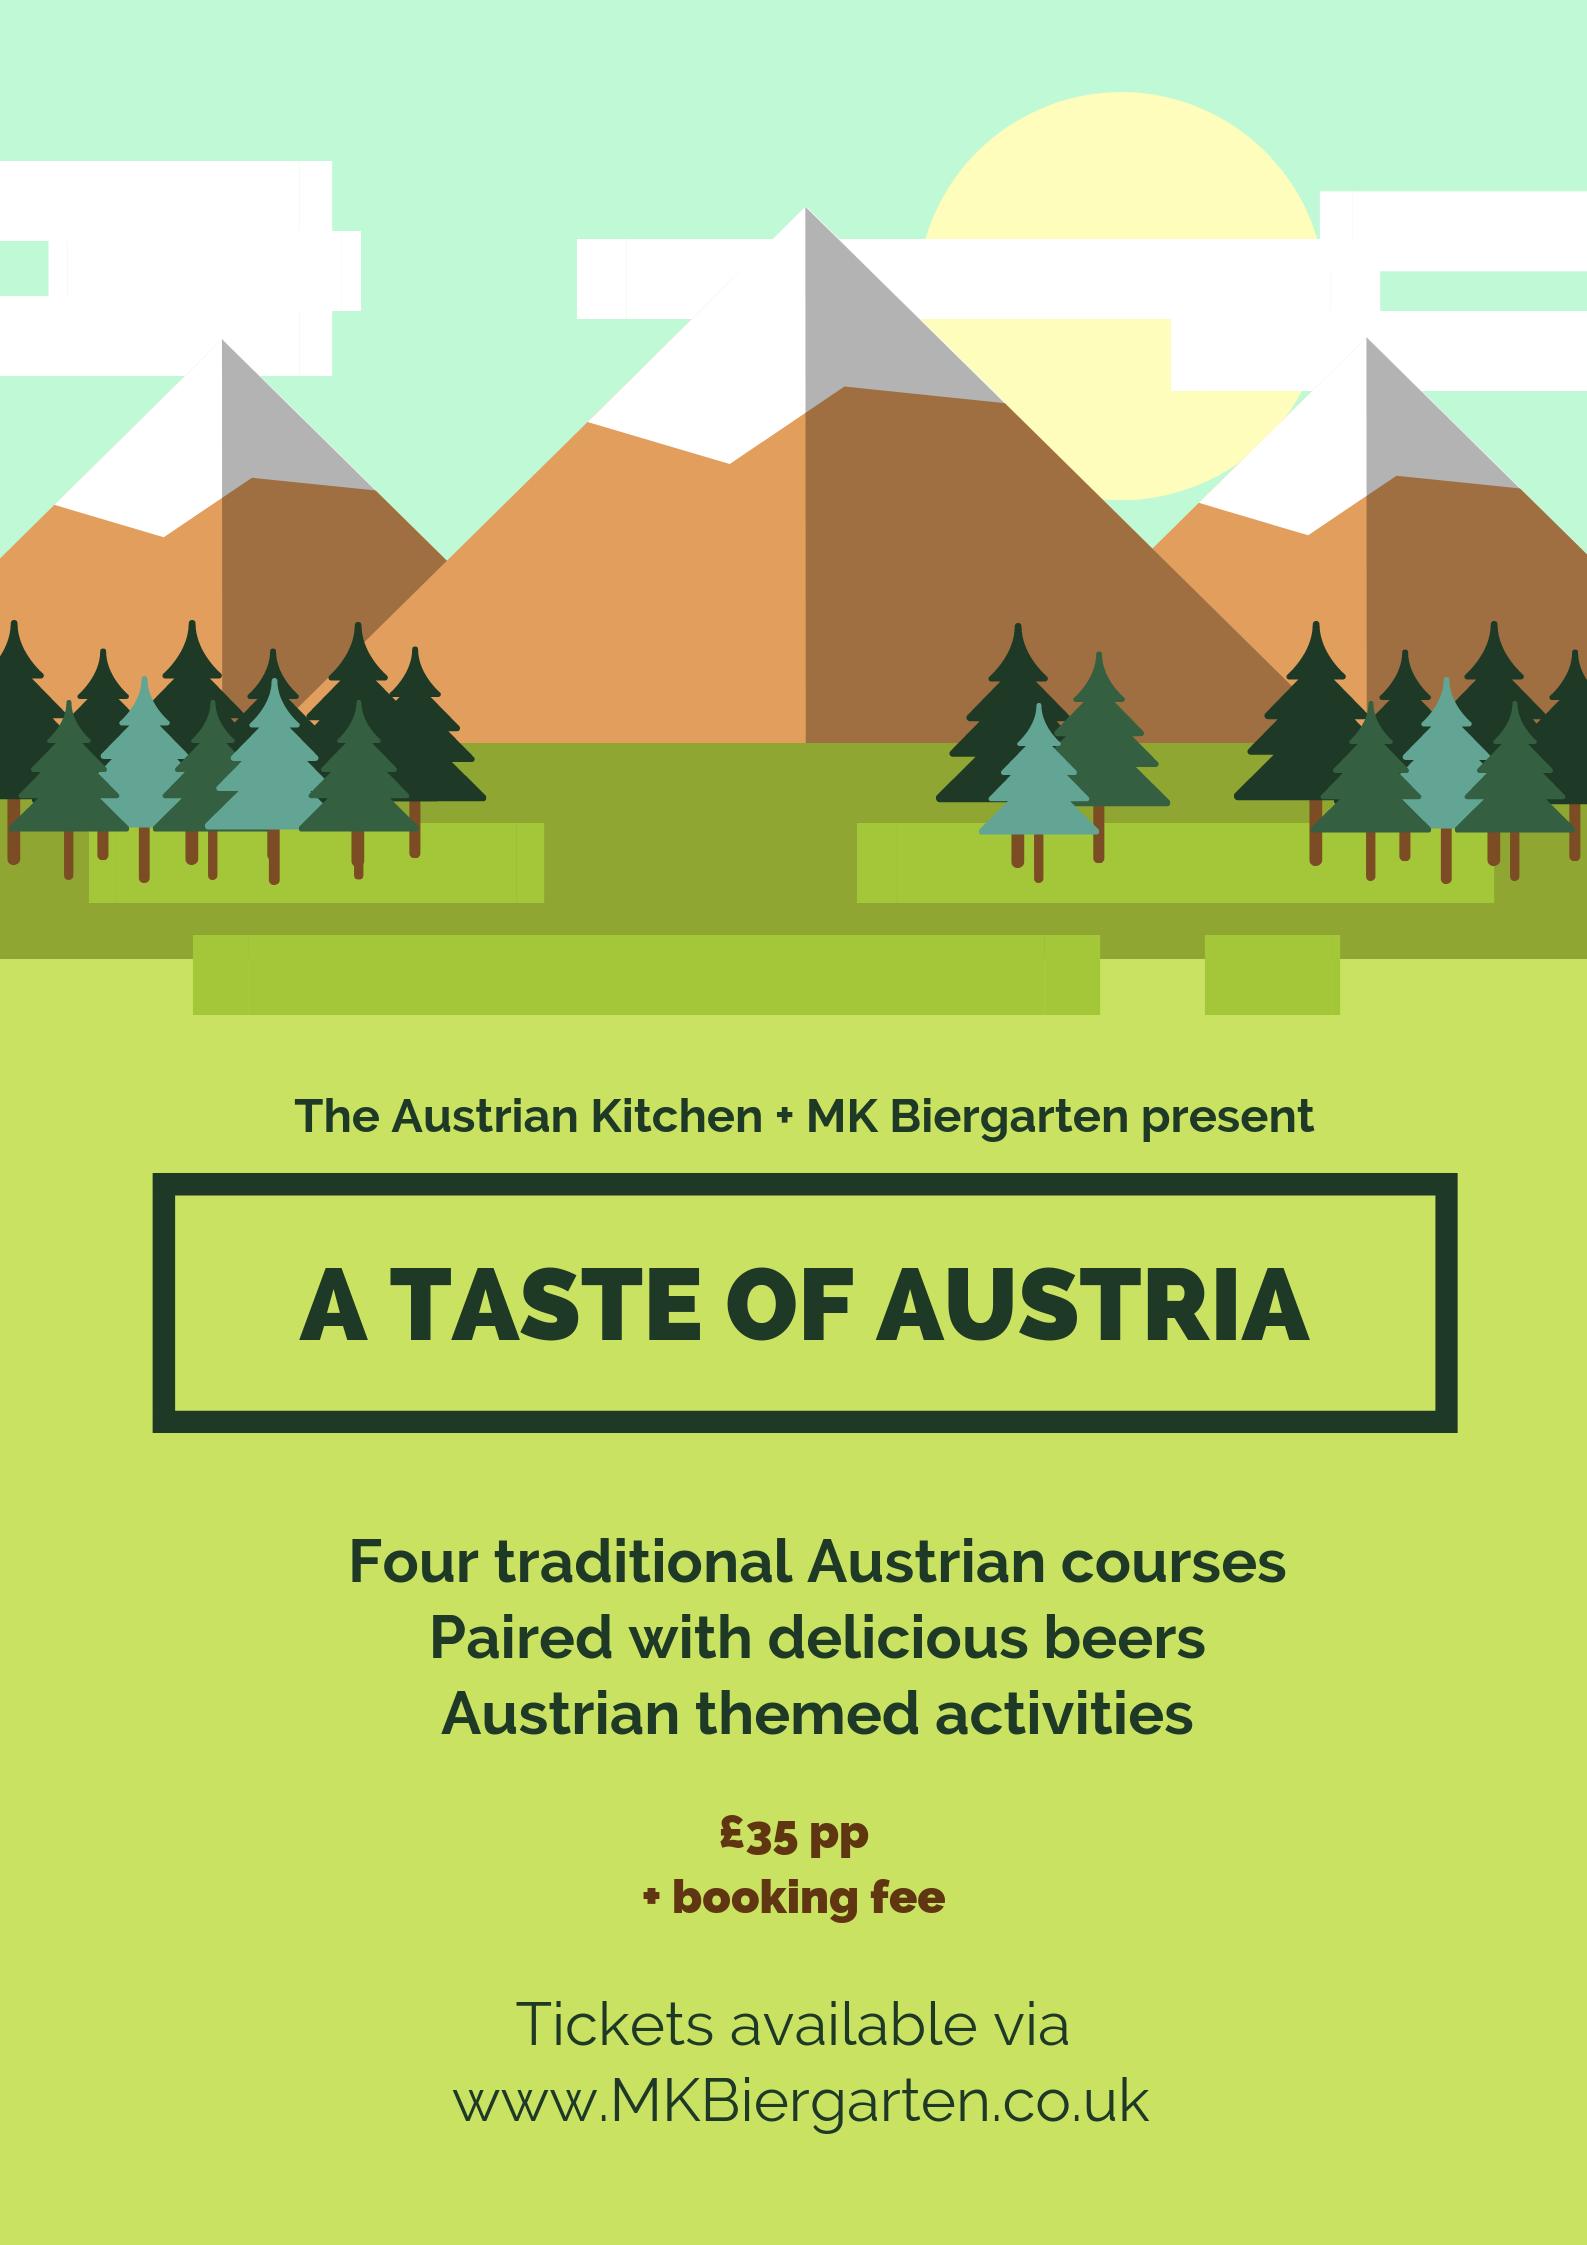 A taste of austria (1).png